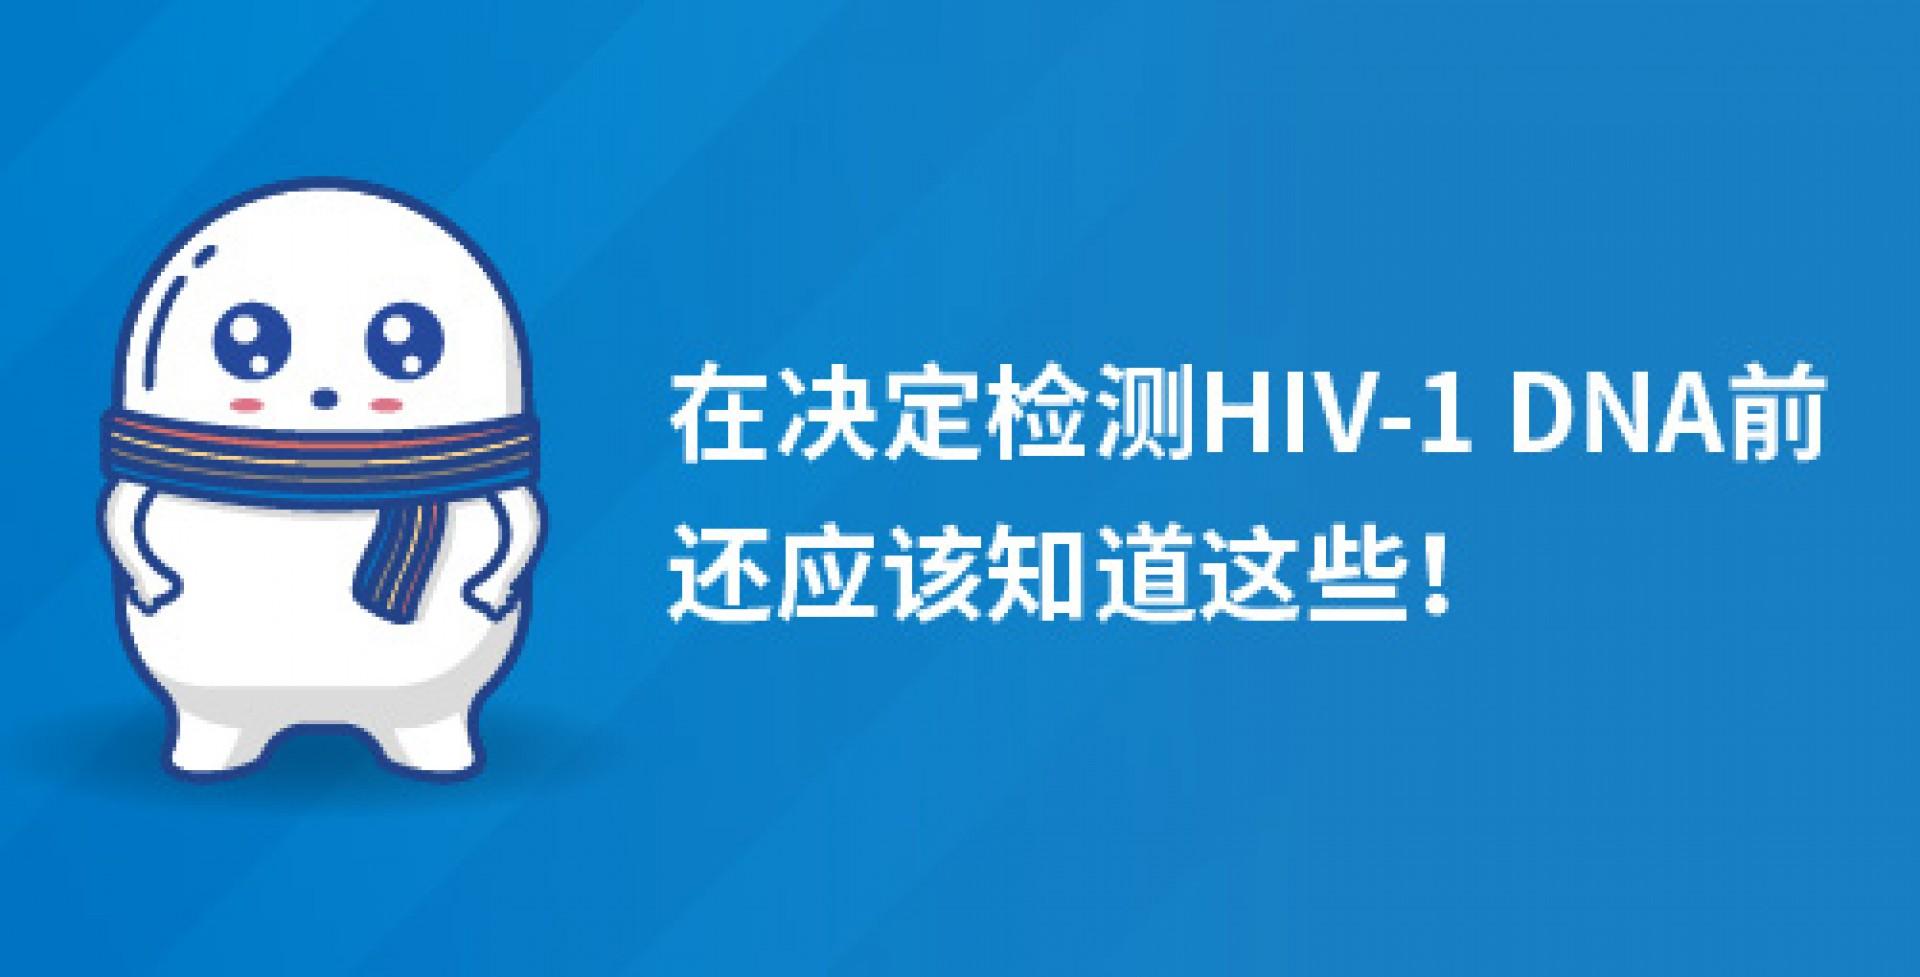 「HIV DNA检测」在决定检测HIV-1 DNA前,还应该知道这些!